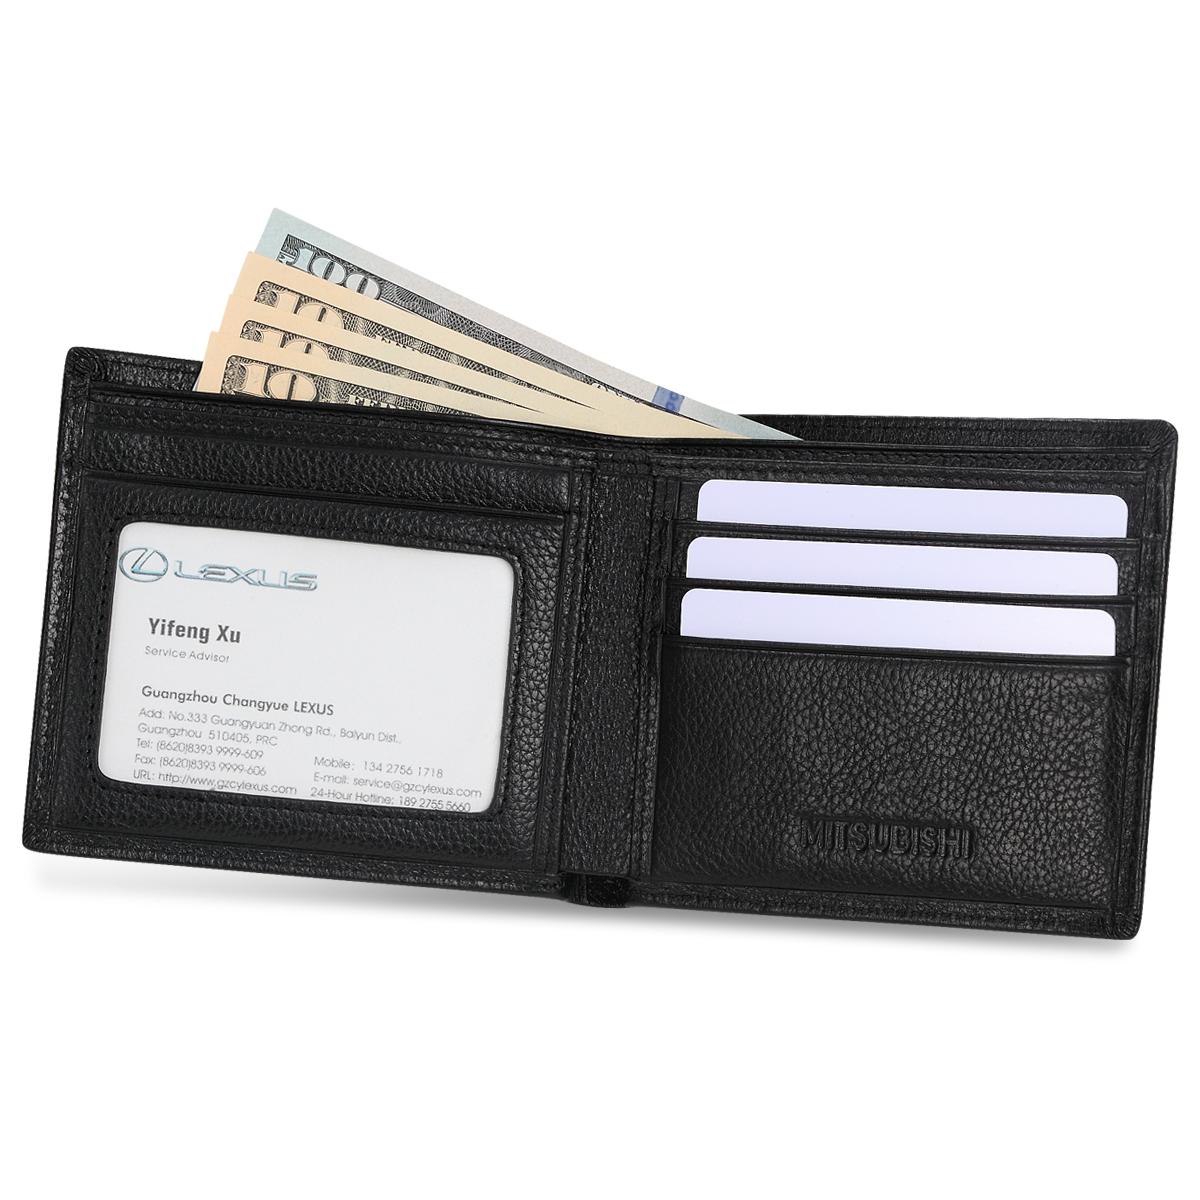 Genuine Leather Mitsubishi Bifold Wallet with 3 Card Slots and ID Window